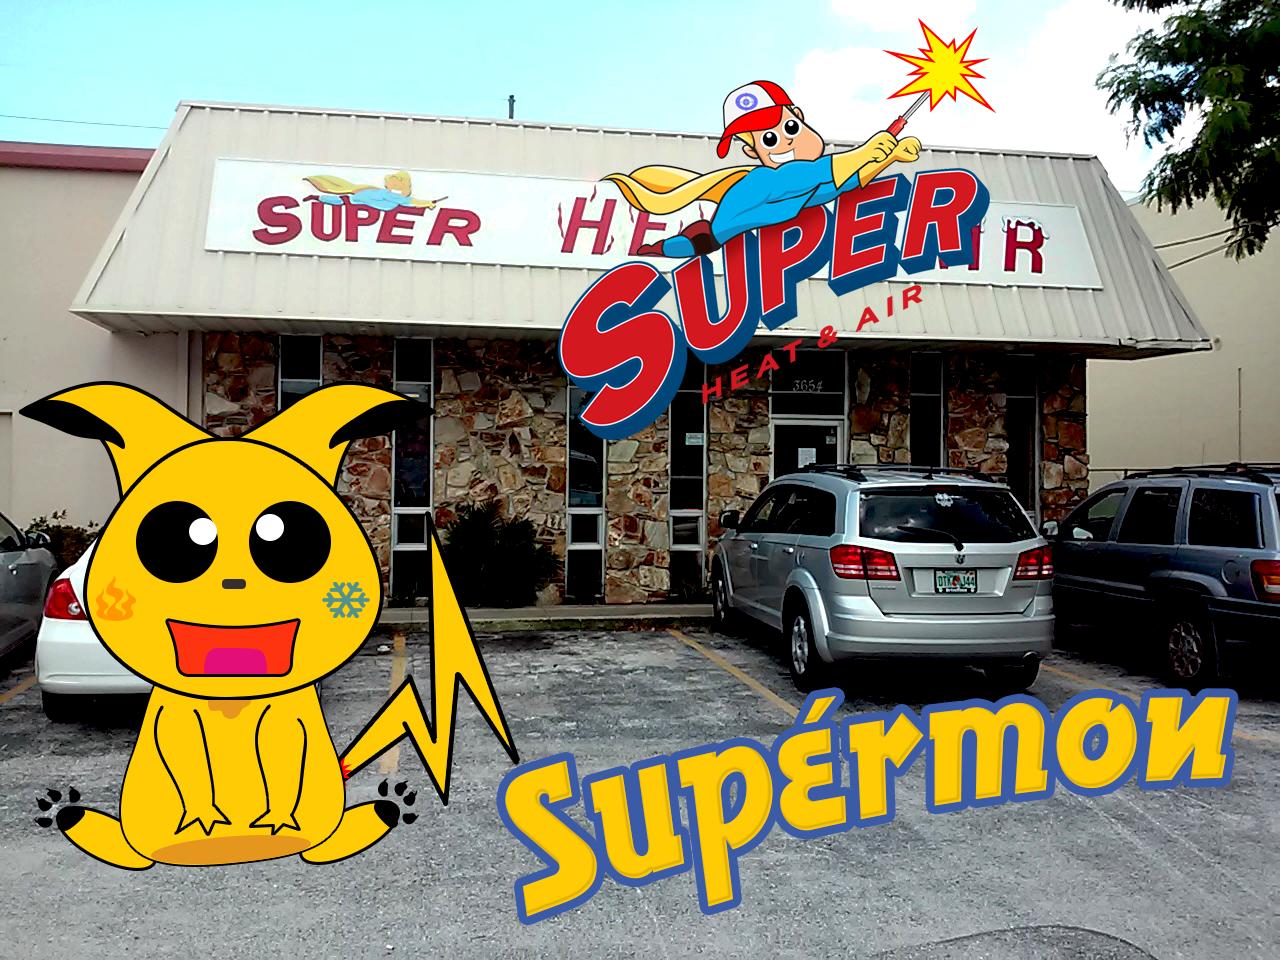 Happy Friday Tampa Bay! With the whole Pokémon craze